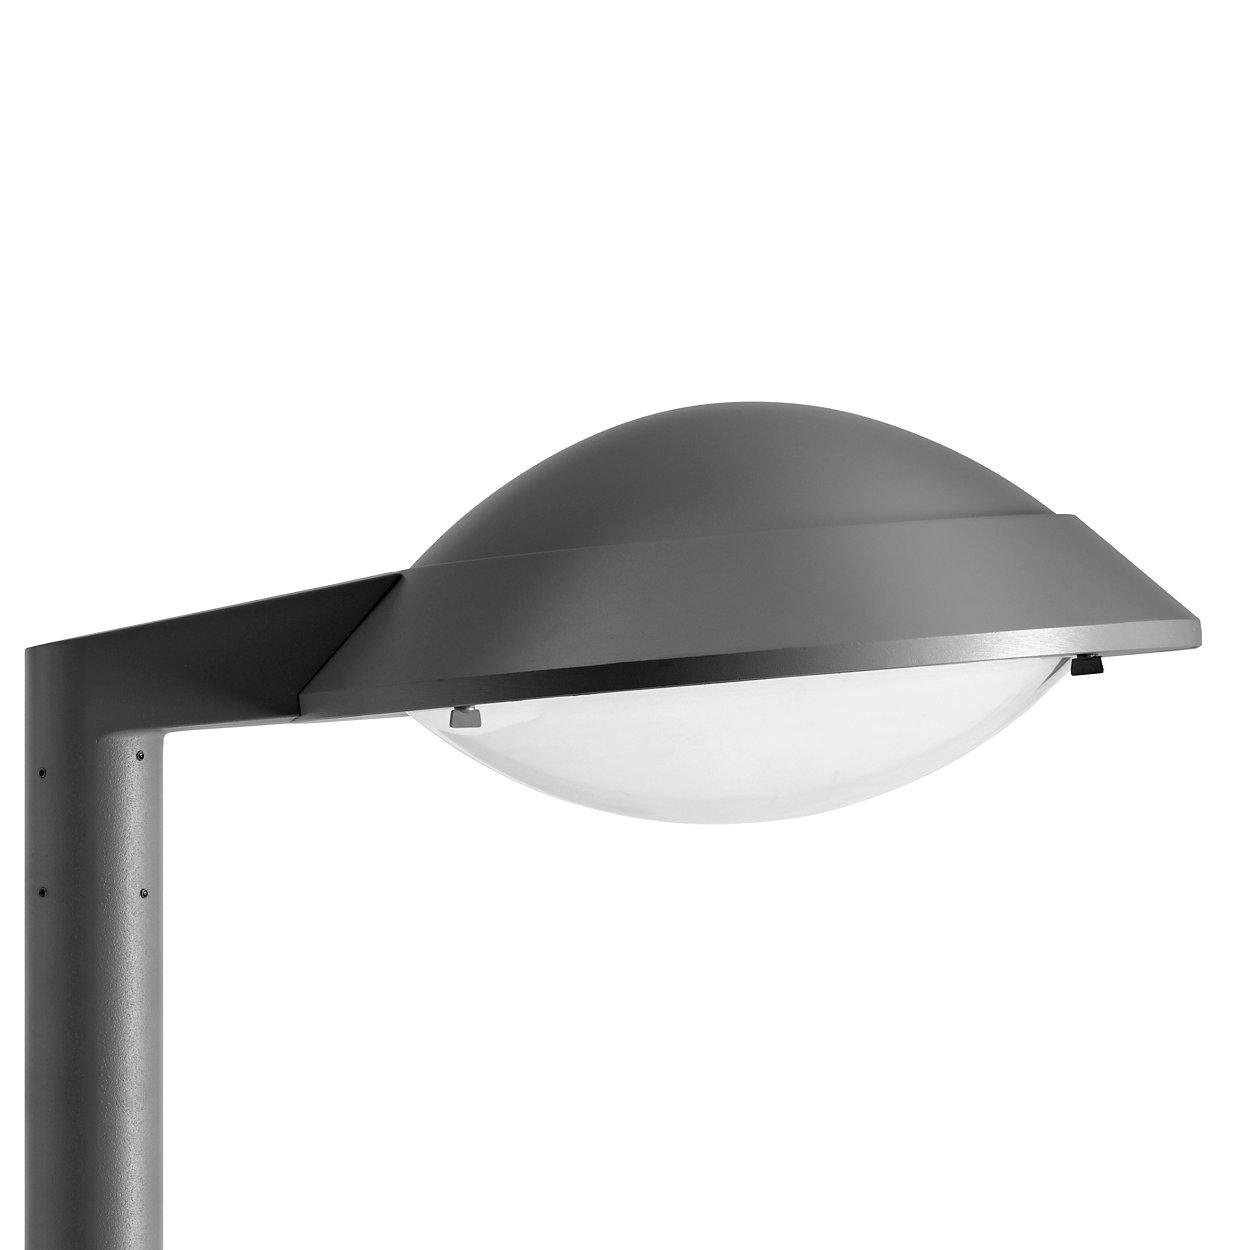 Clean design for a versatile luminaire